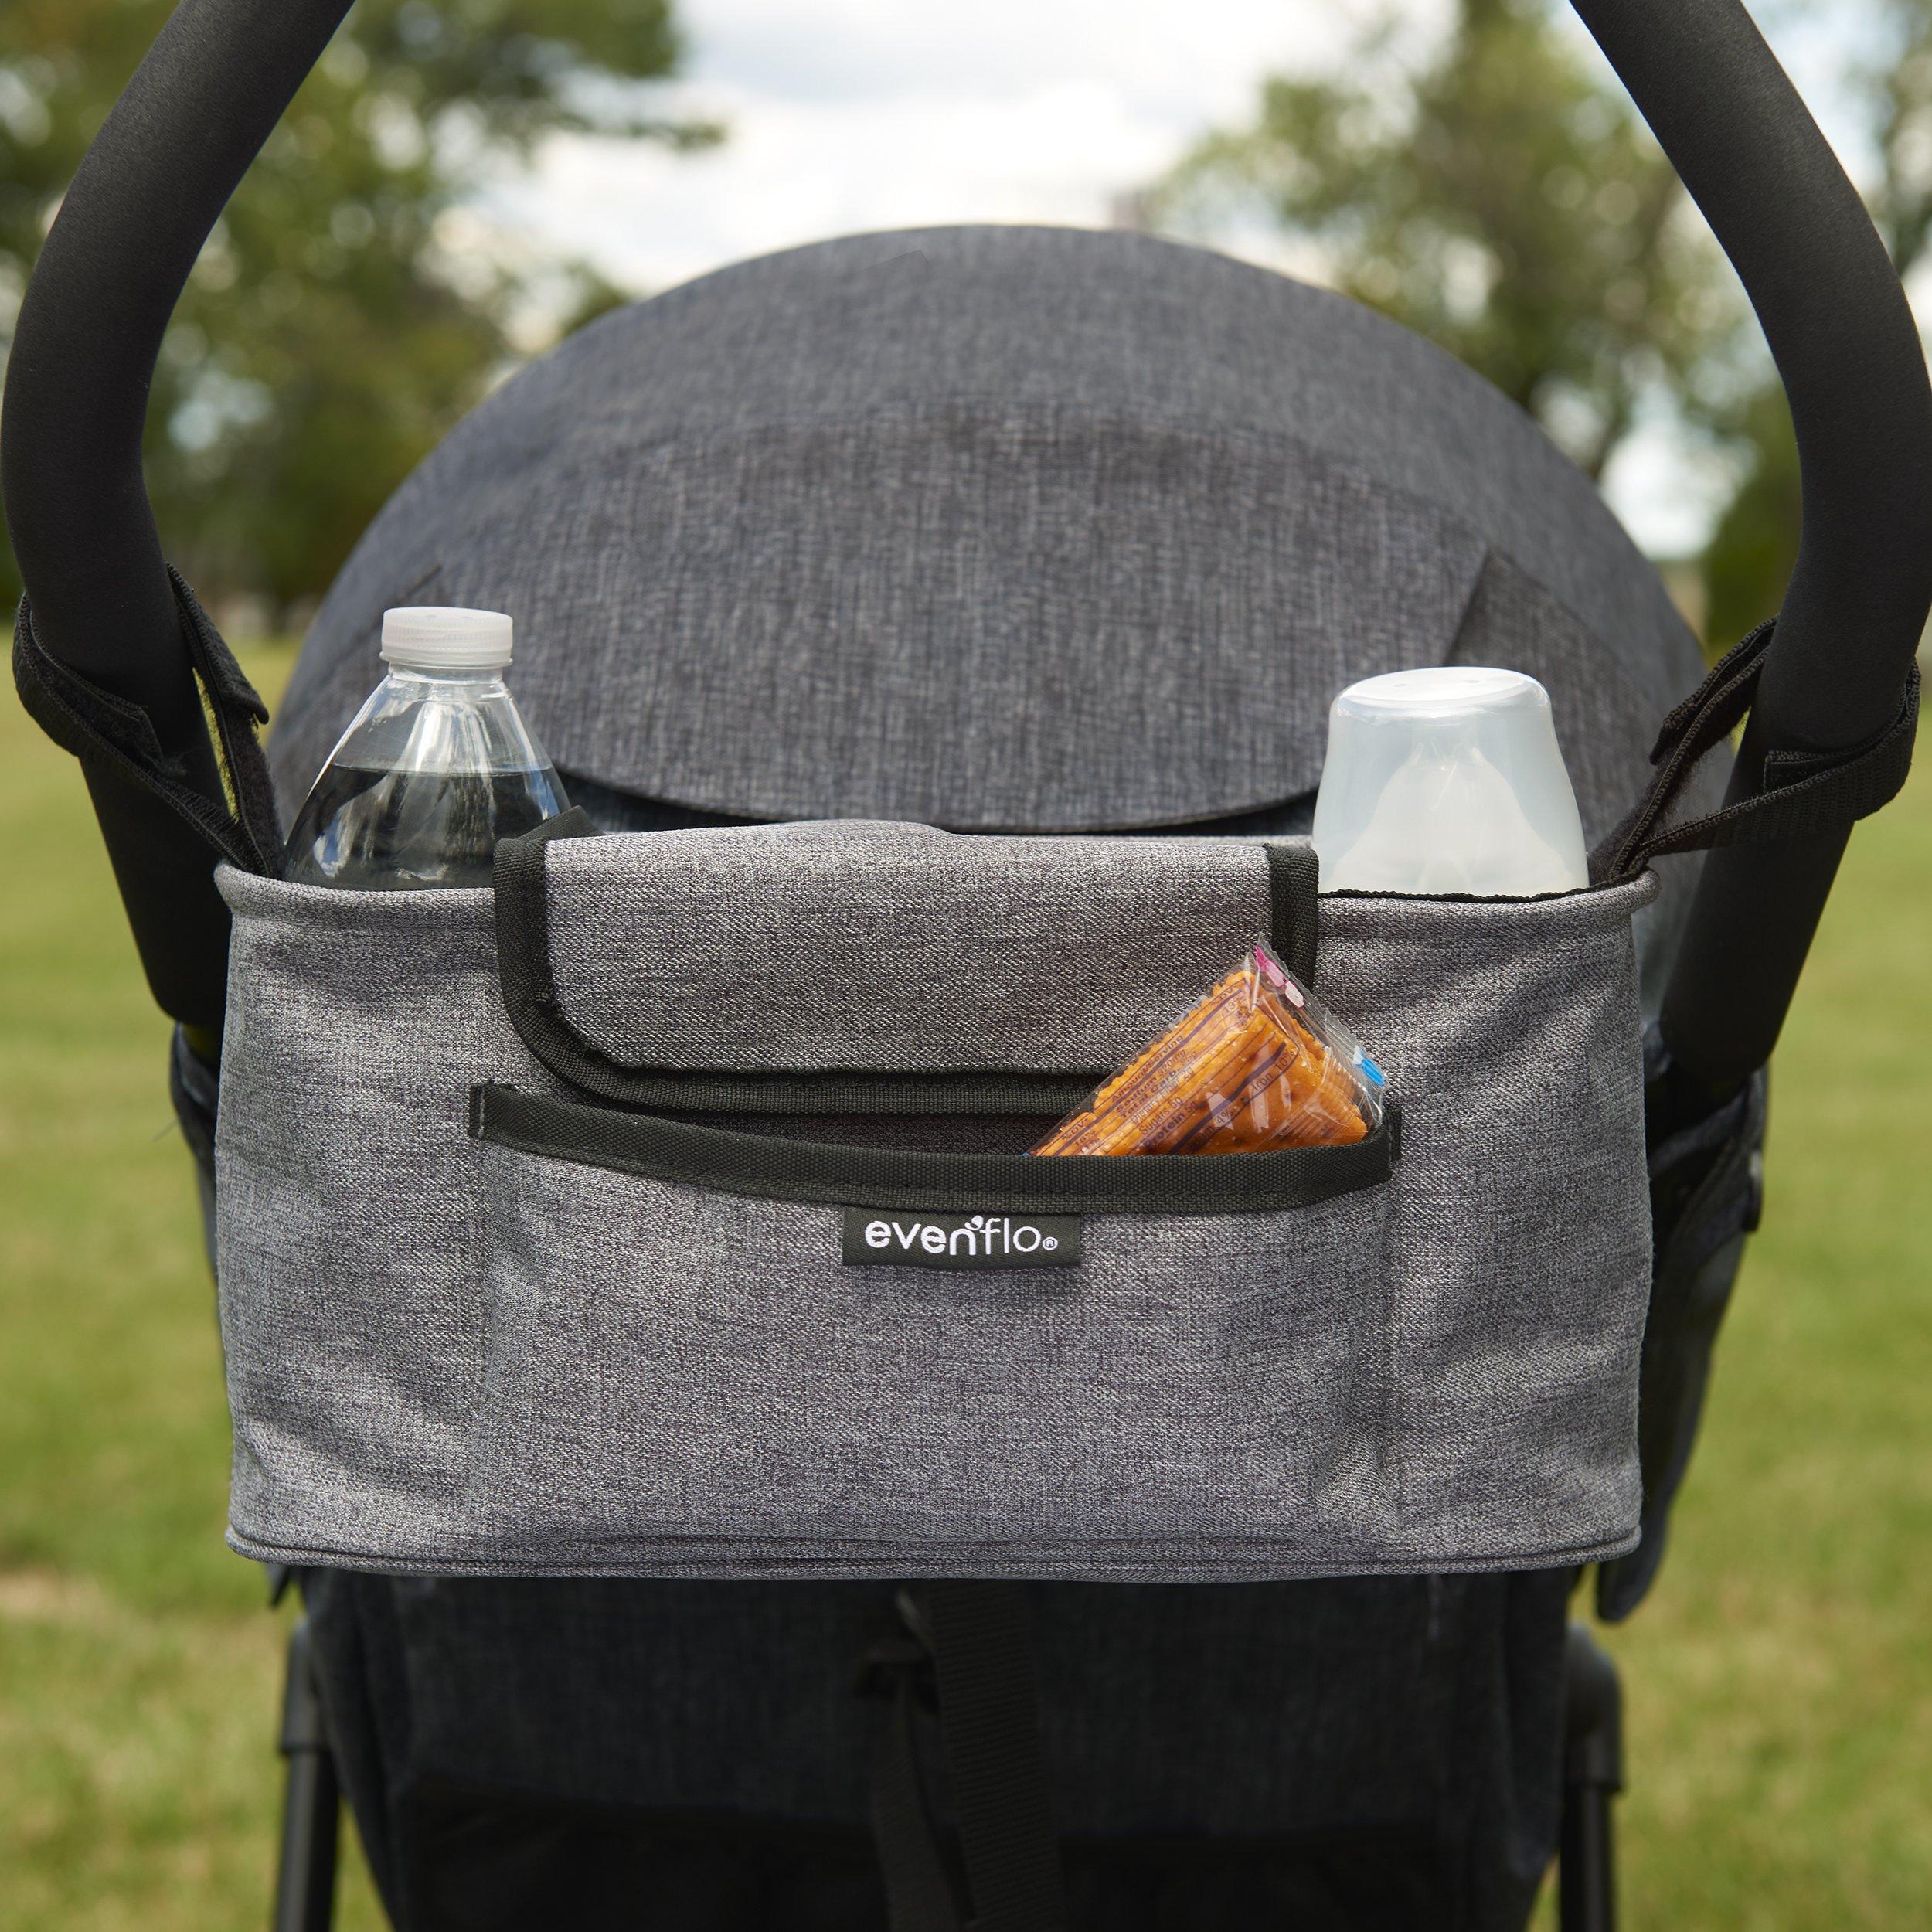 Evenflo Stroller Accessories Starter Kit by Evenflo (Image #10)